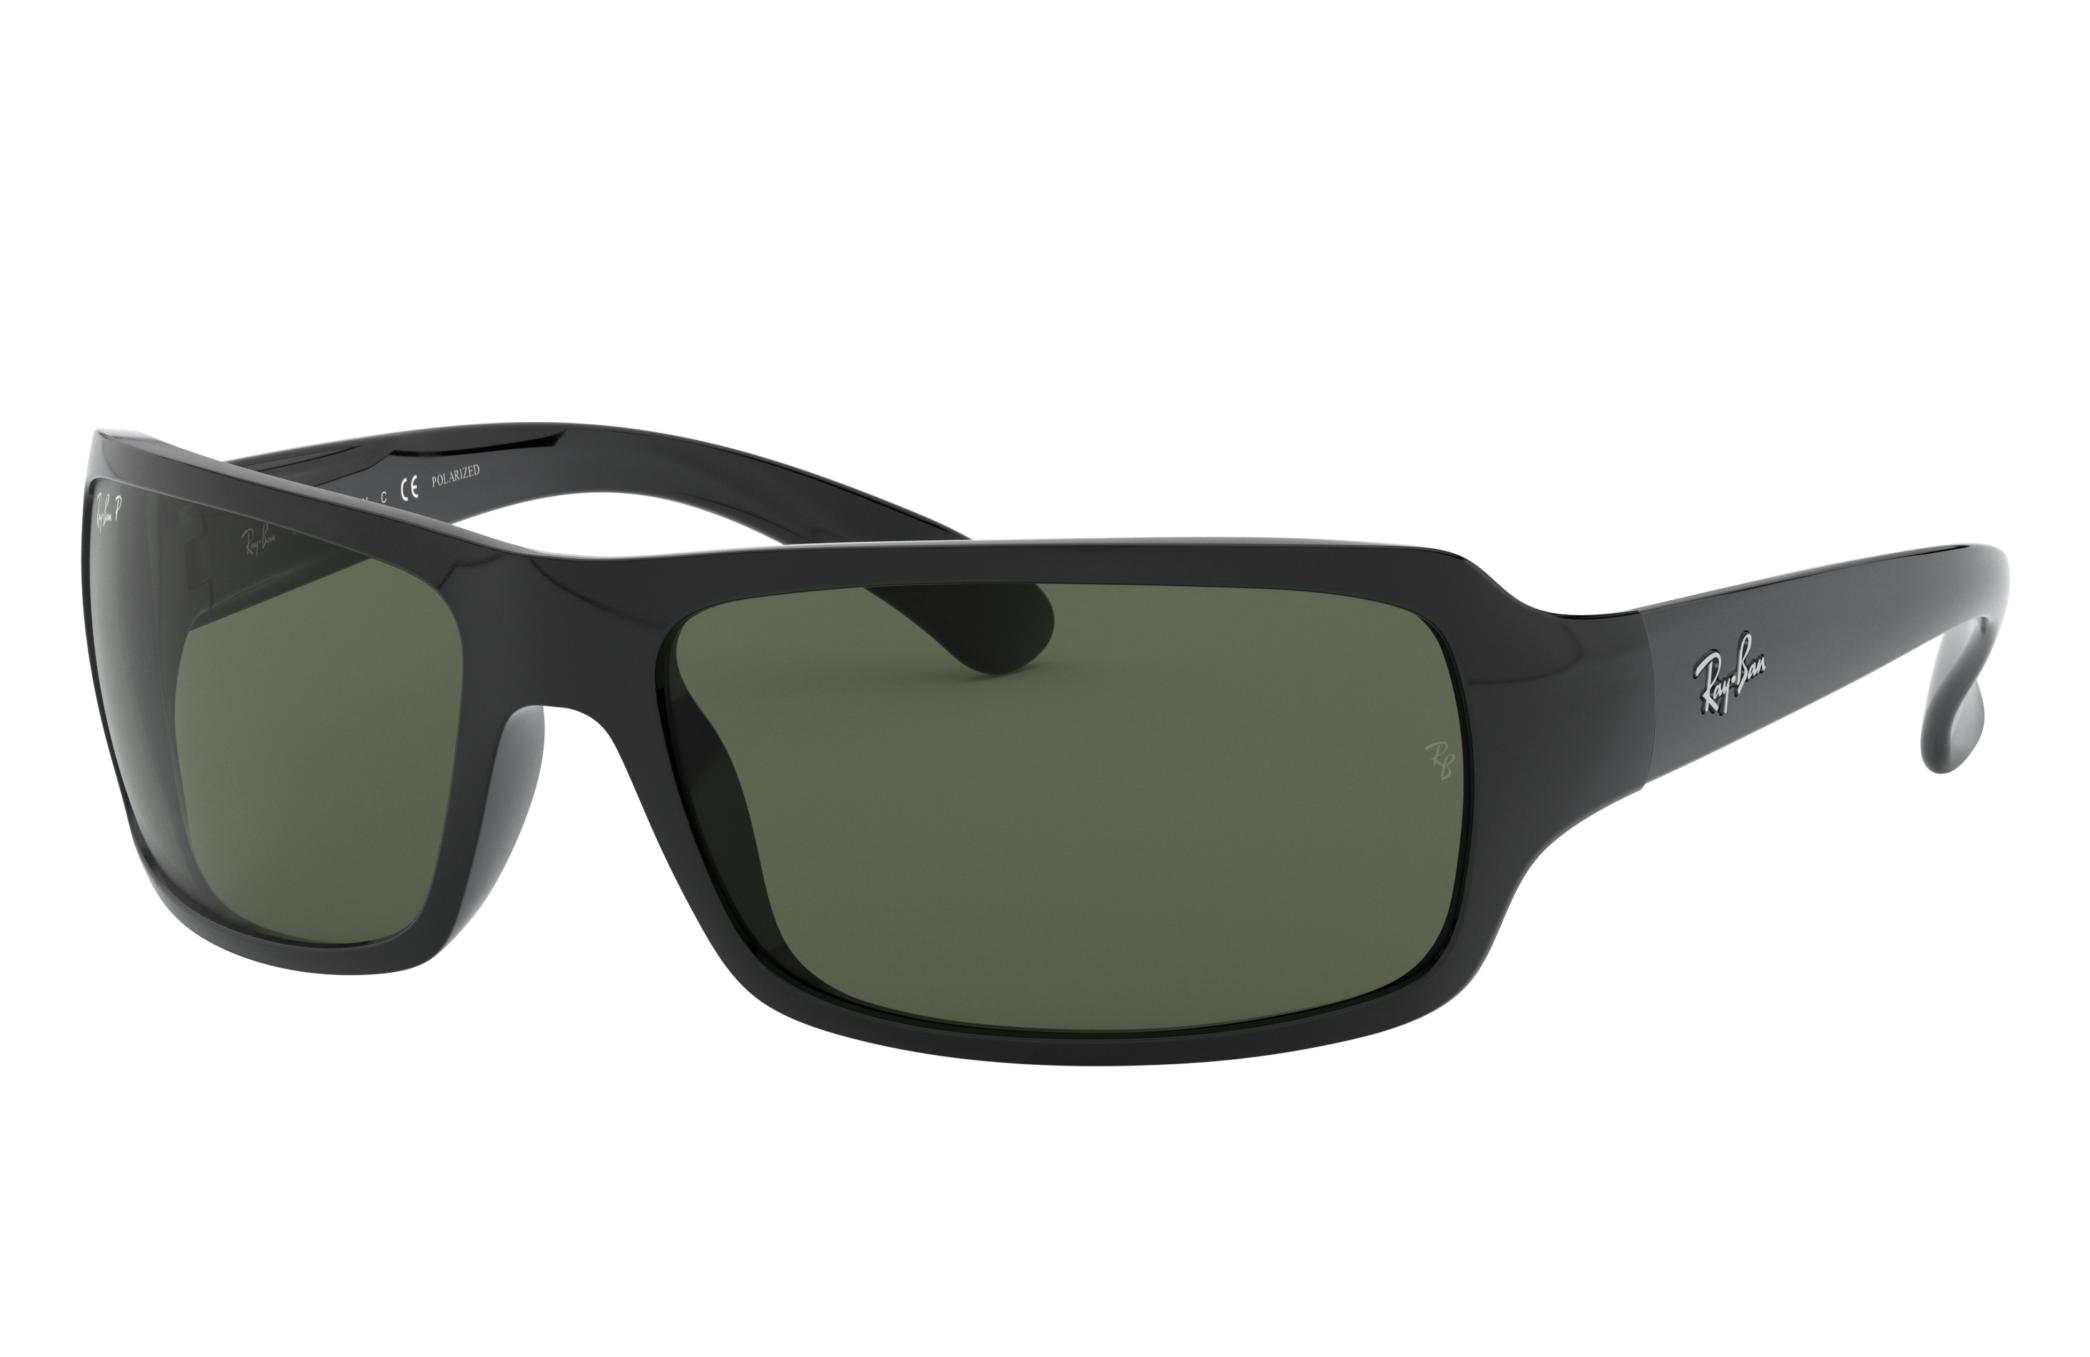 Ray-Ban Rb4075 Black, Polarized Green Lenses - RB4075